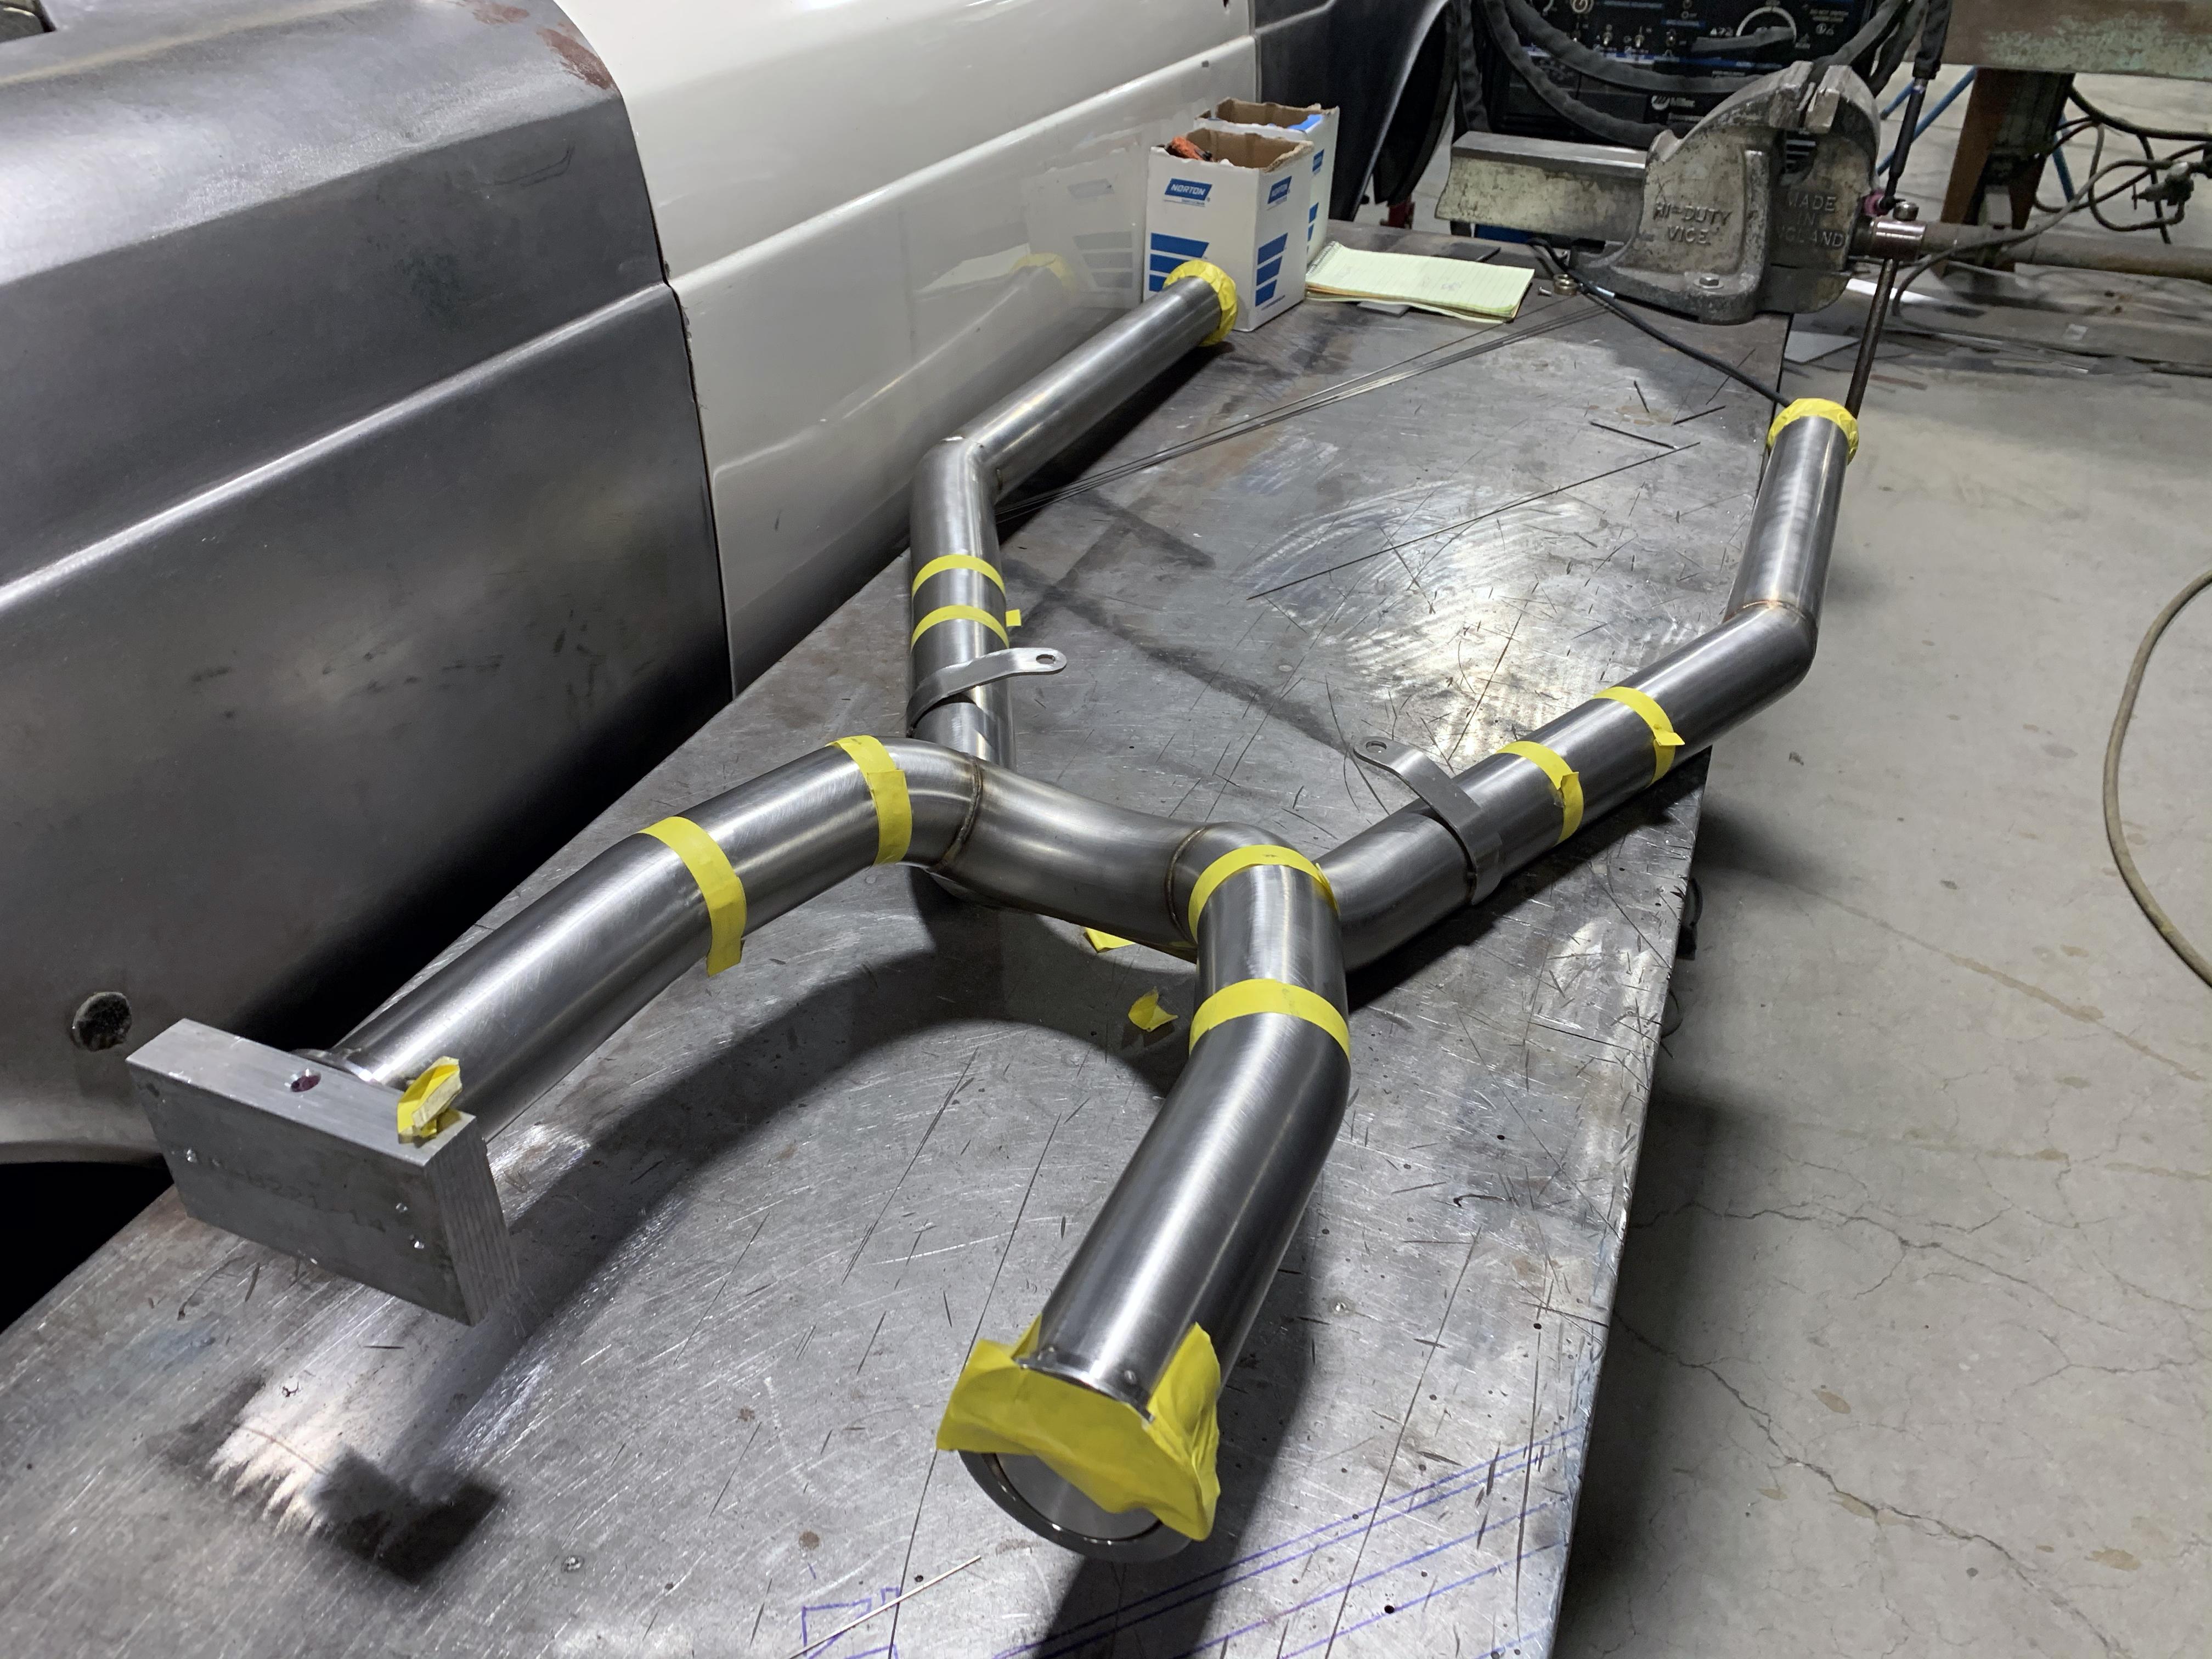 Scotts-Hotrods-82-C10-Blazer-2WD-17